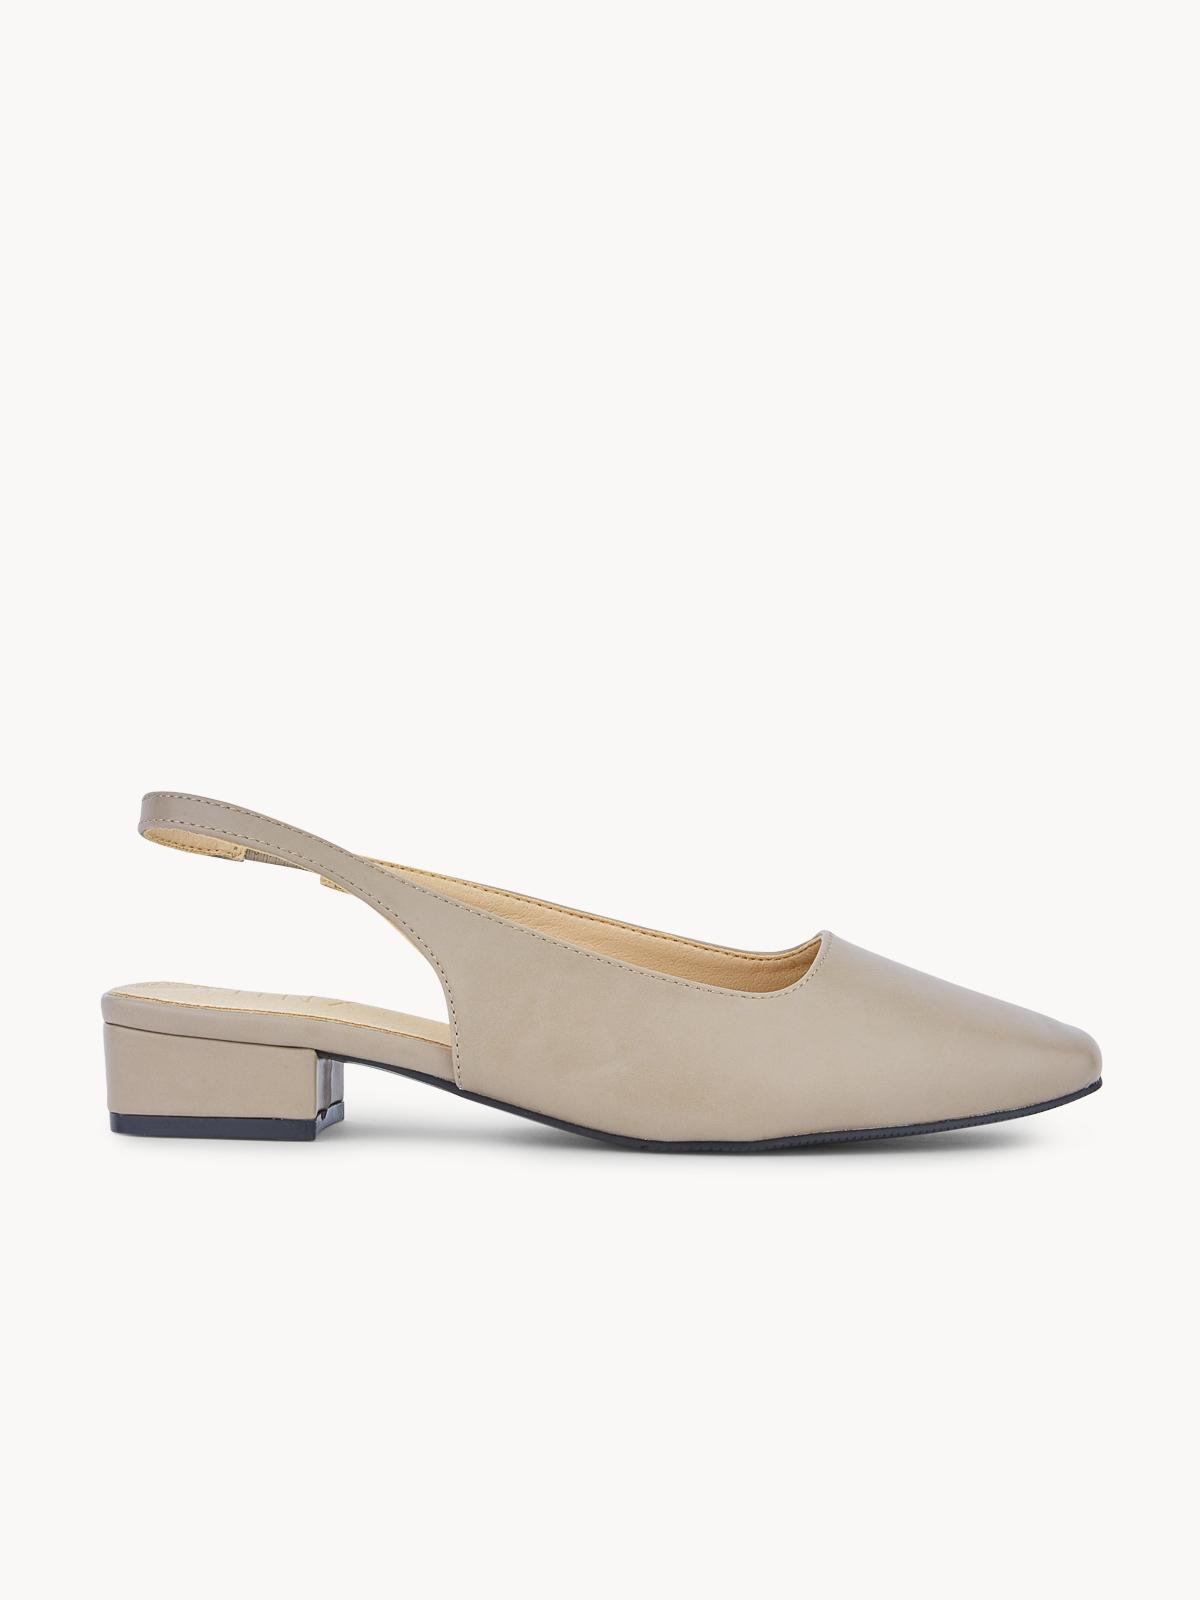 Minx Alice Slingback Sandals Taupe